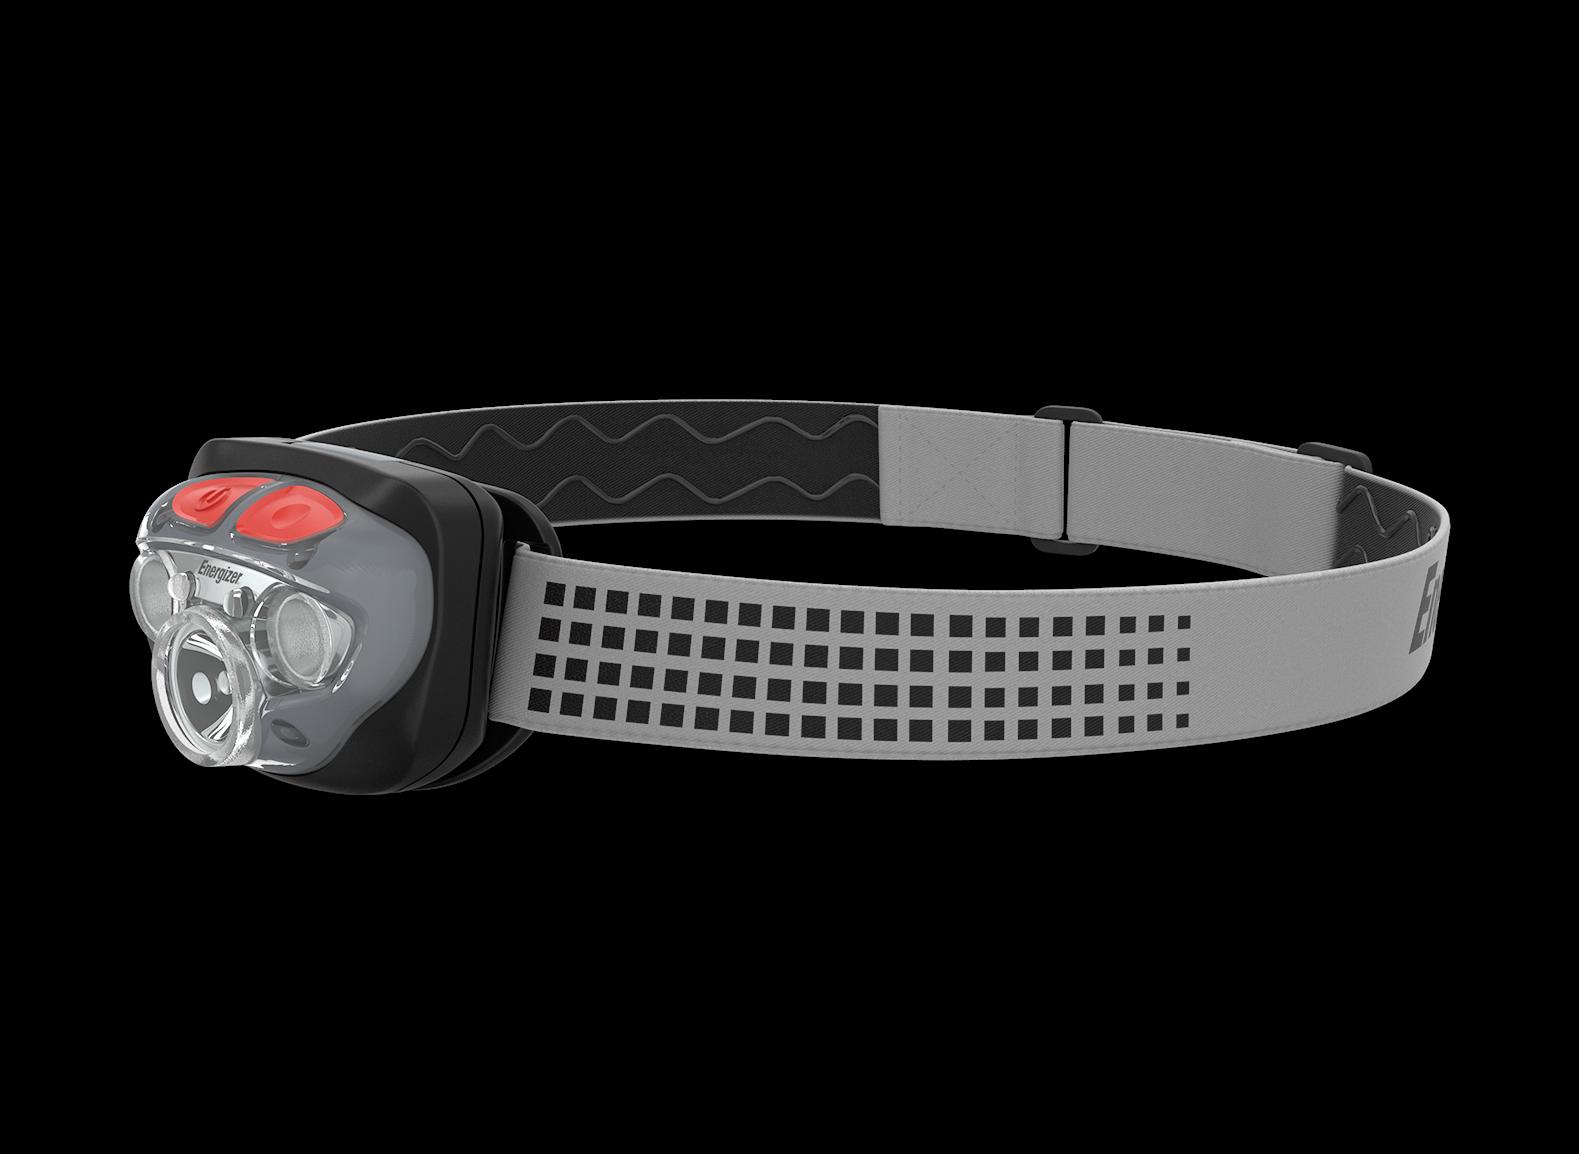 Energizer Gray Vision HD Industrial Headlamp